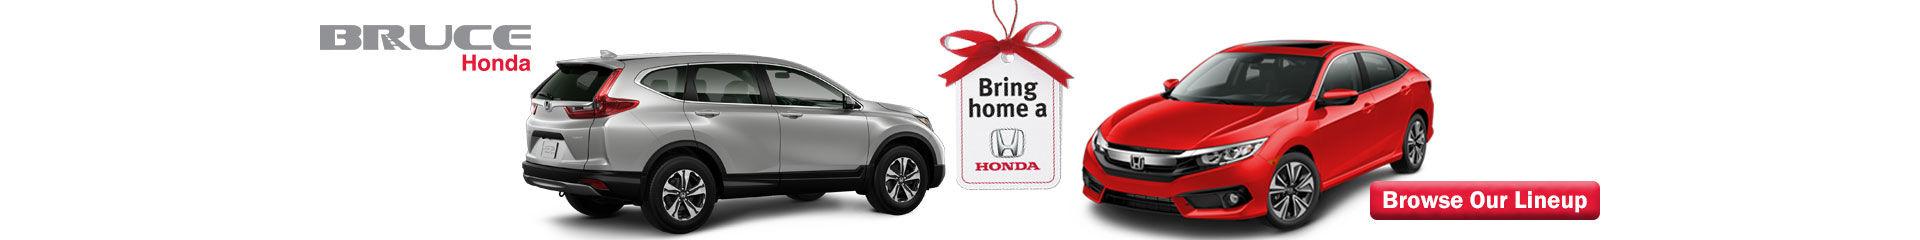 2018-11 Bring Home a Honda